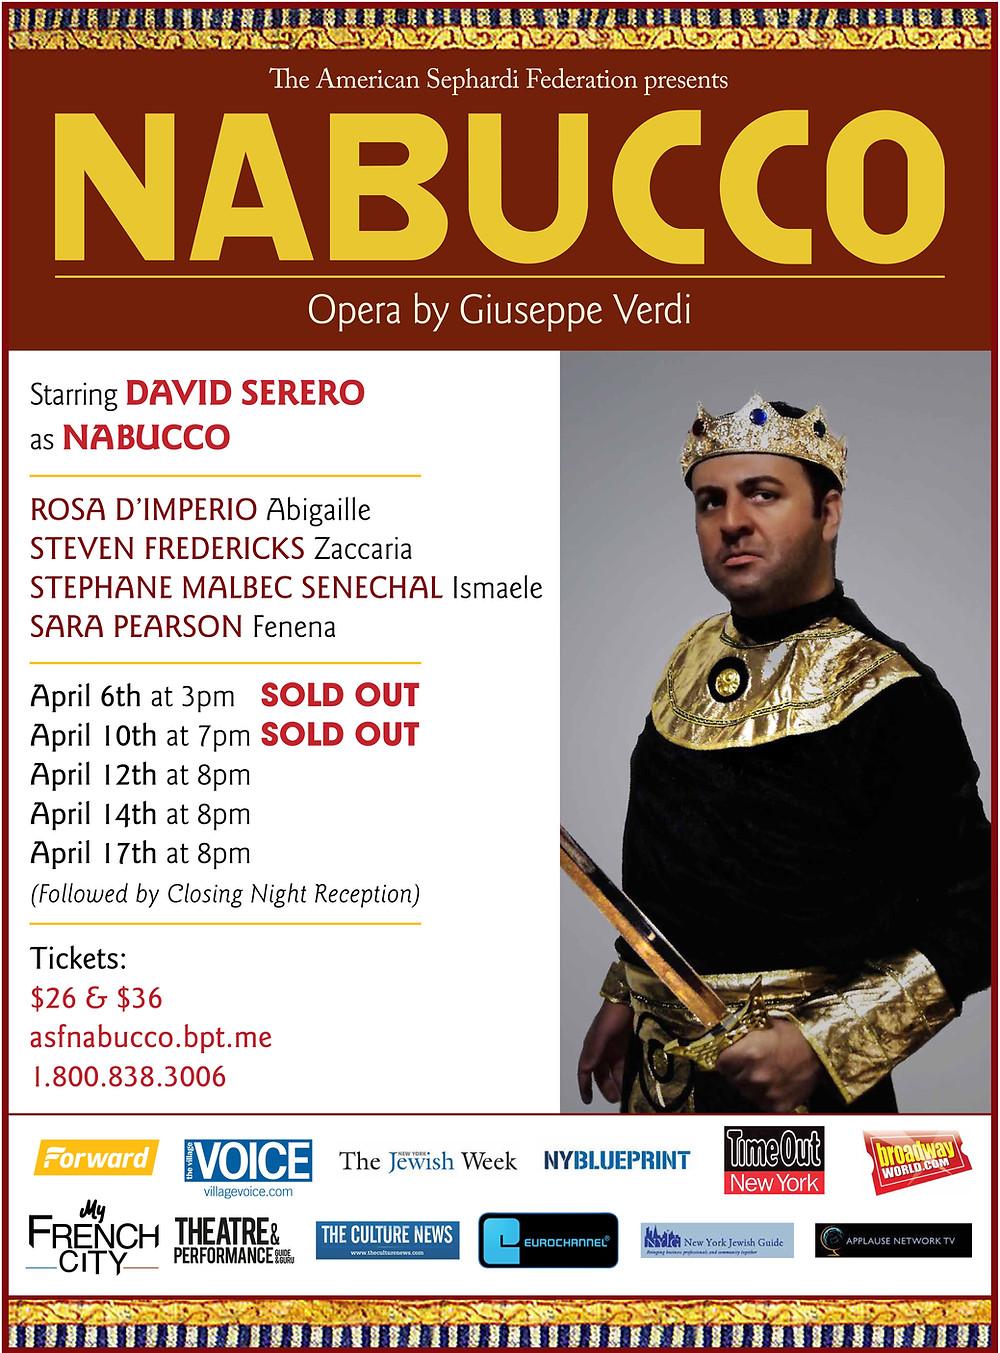 David Serero as Nabucco - The Culture News